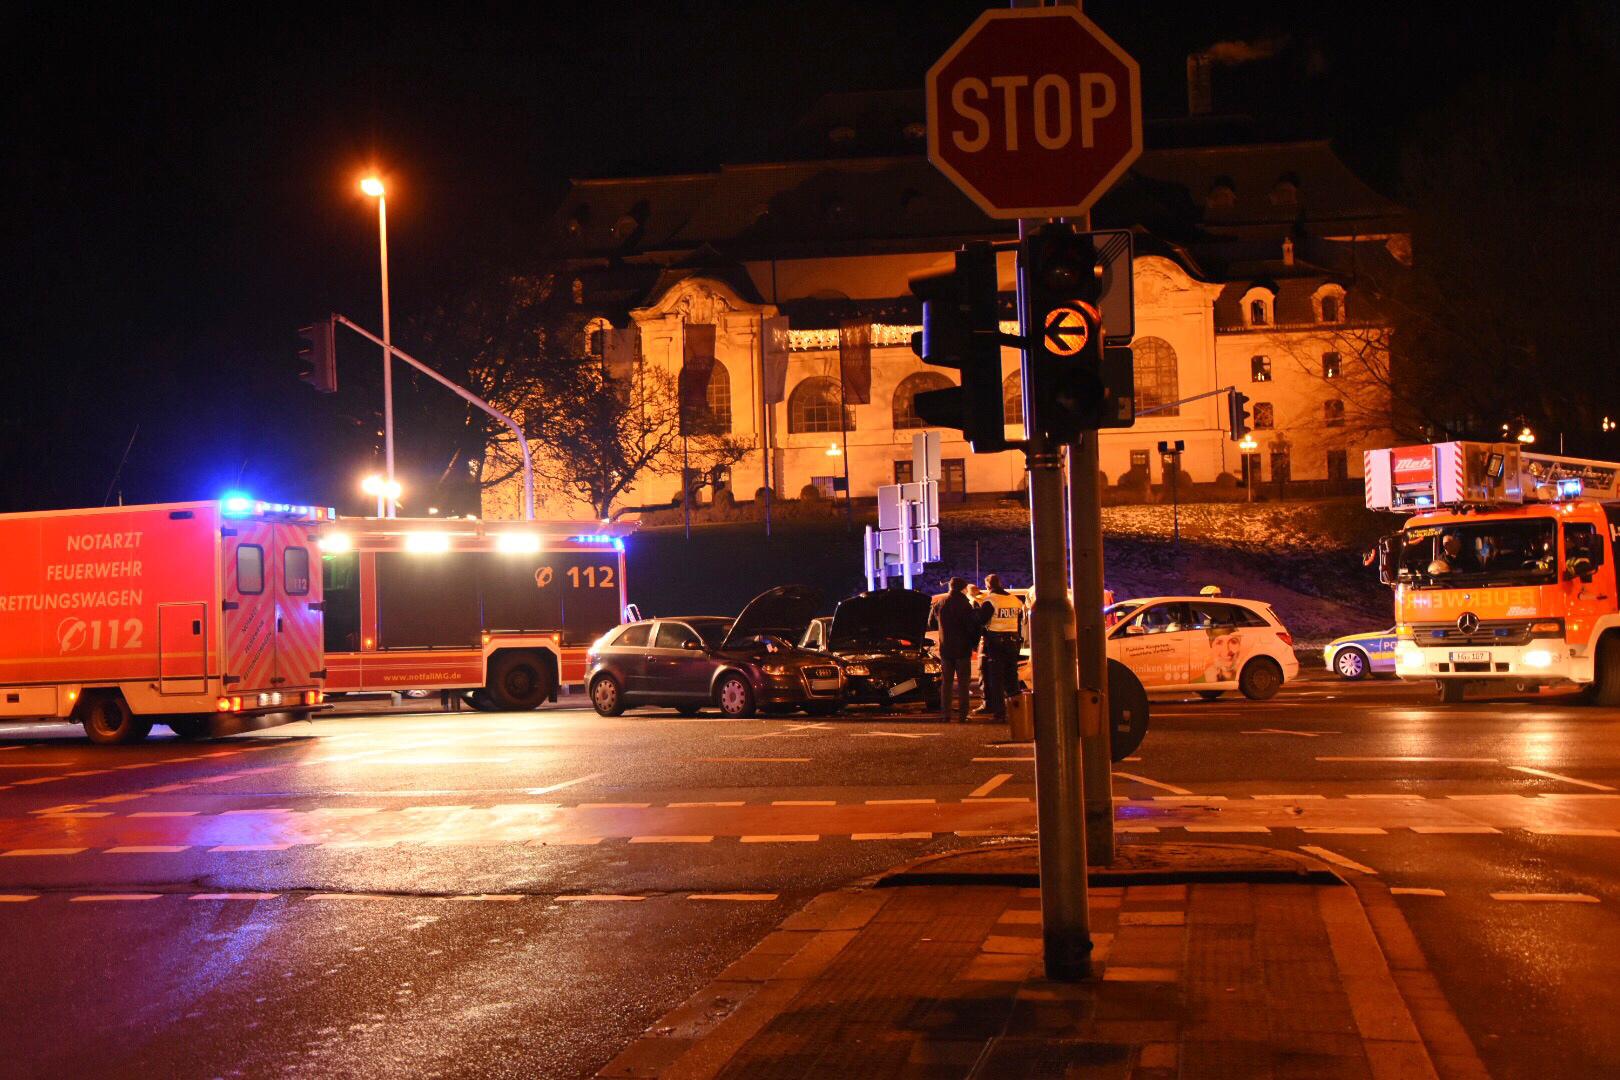 Bismarckstraße Mönchengladbach mönchengladbach ots unfallort mg hohenzollernstraße